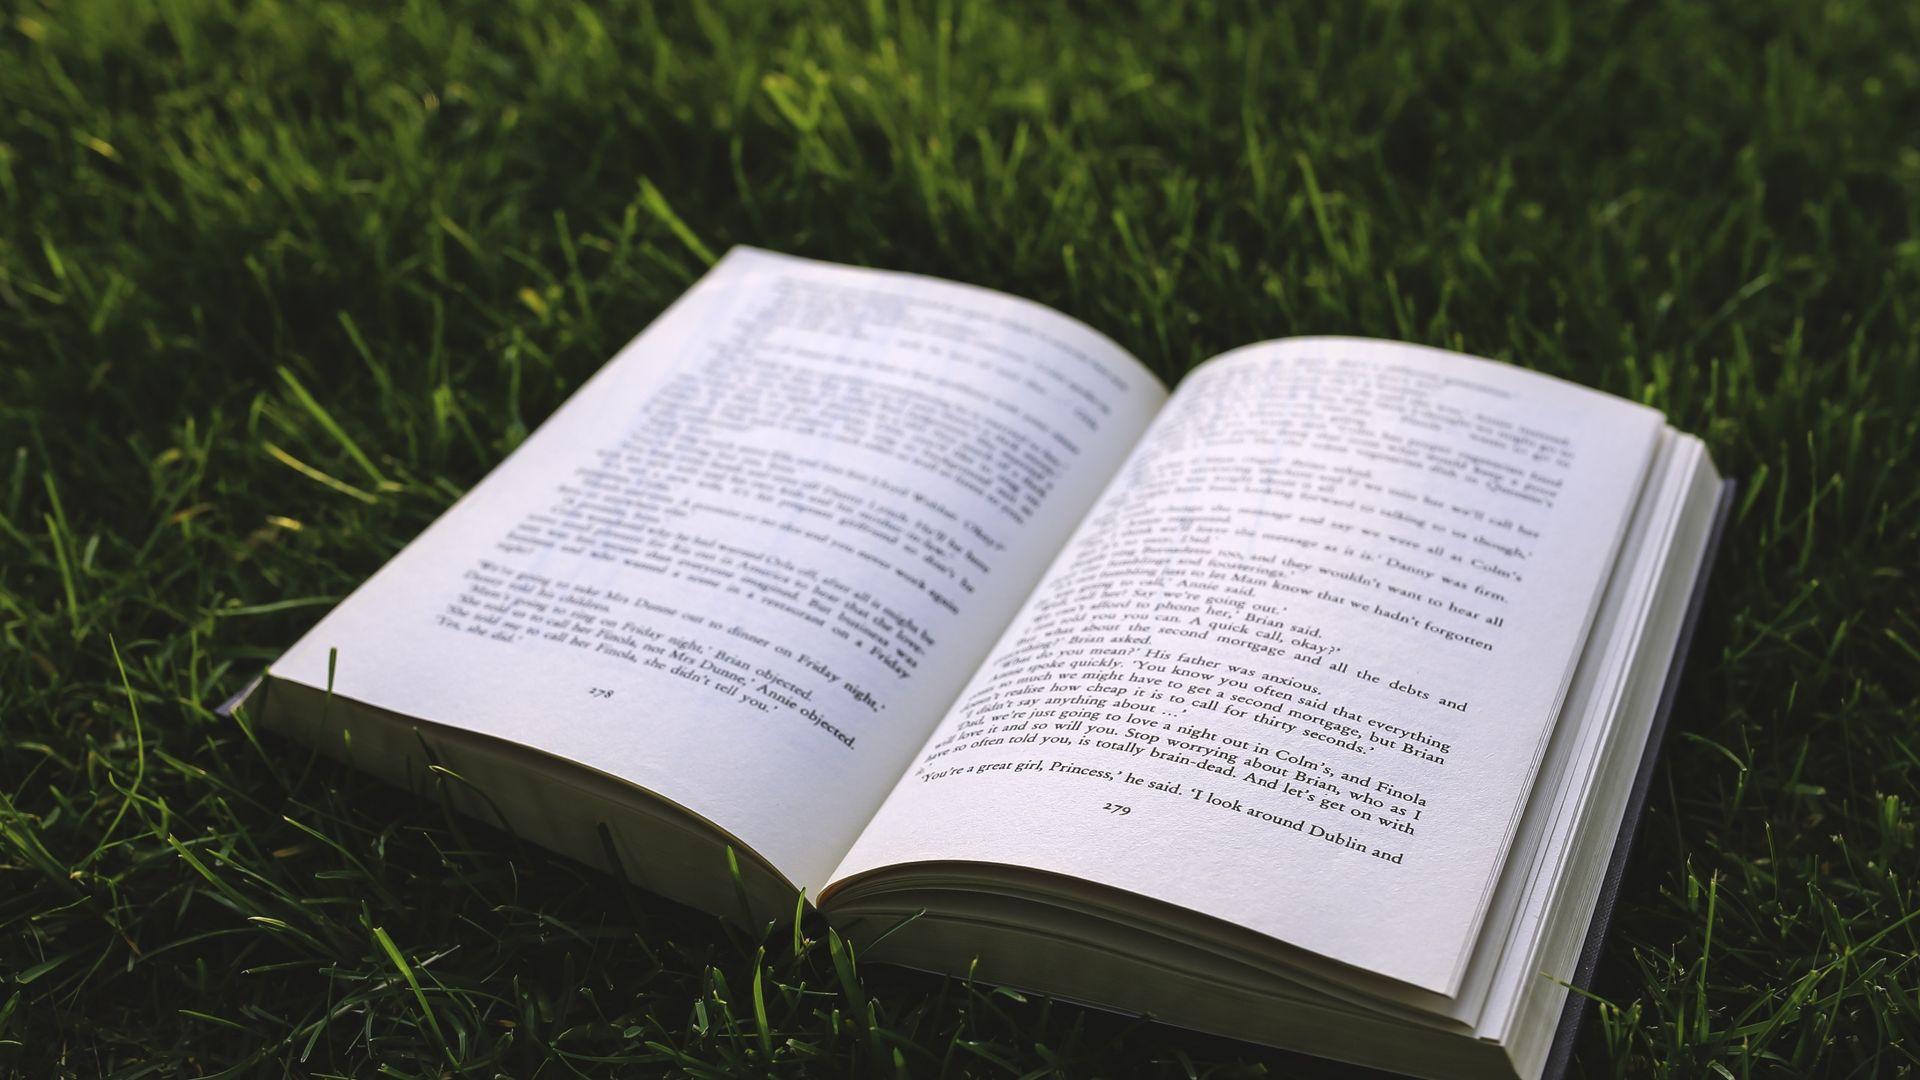 Livre Herbe 10 000 Fonds D Ecran Hd Gratuits Et De Qualite